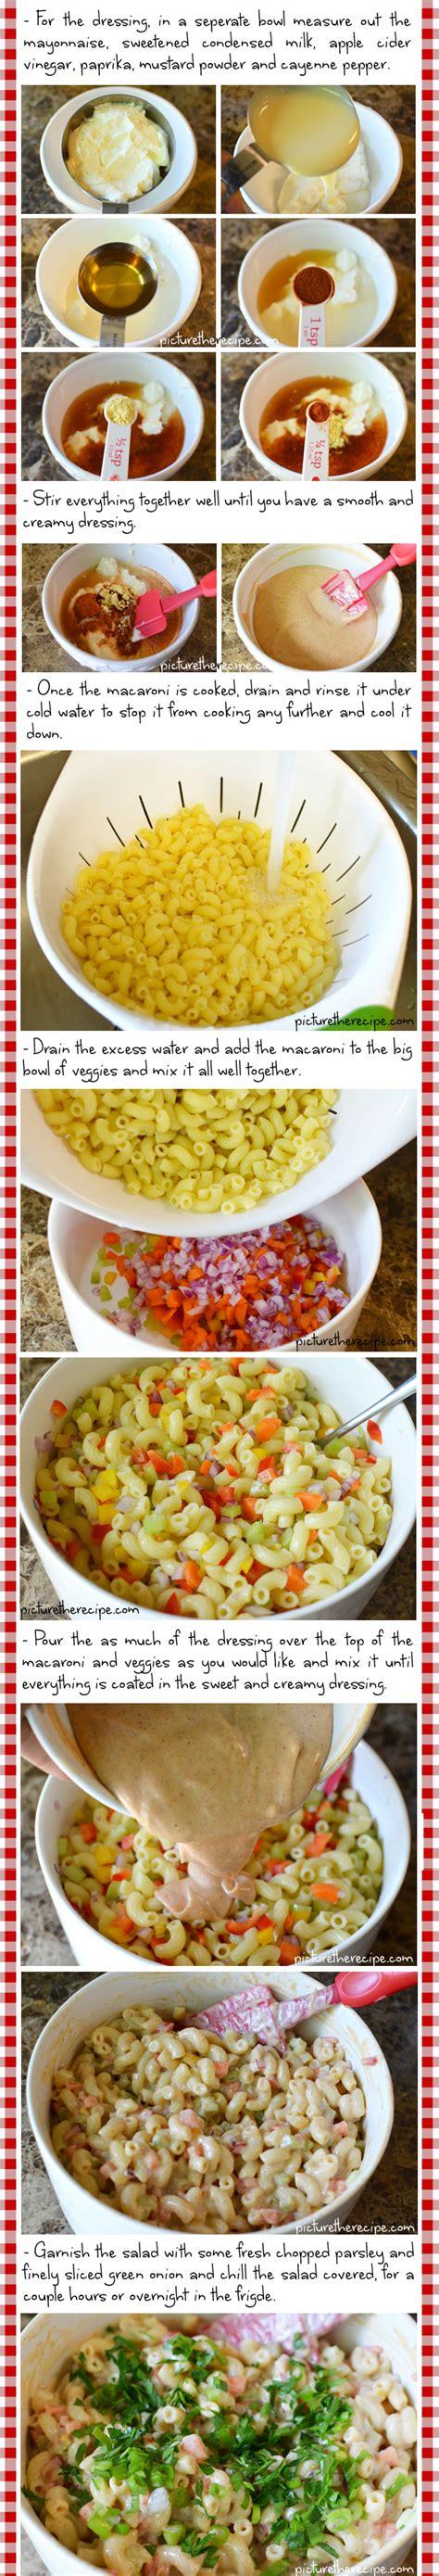 Sweet N Creamy Macaroni Salad Picture The Recipe | sweet n creamy macaroni salad recipe part2 picture the